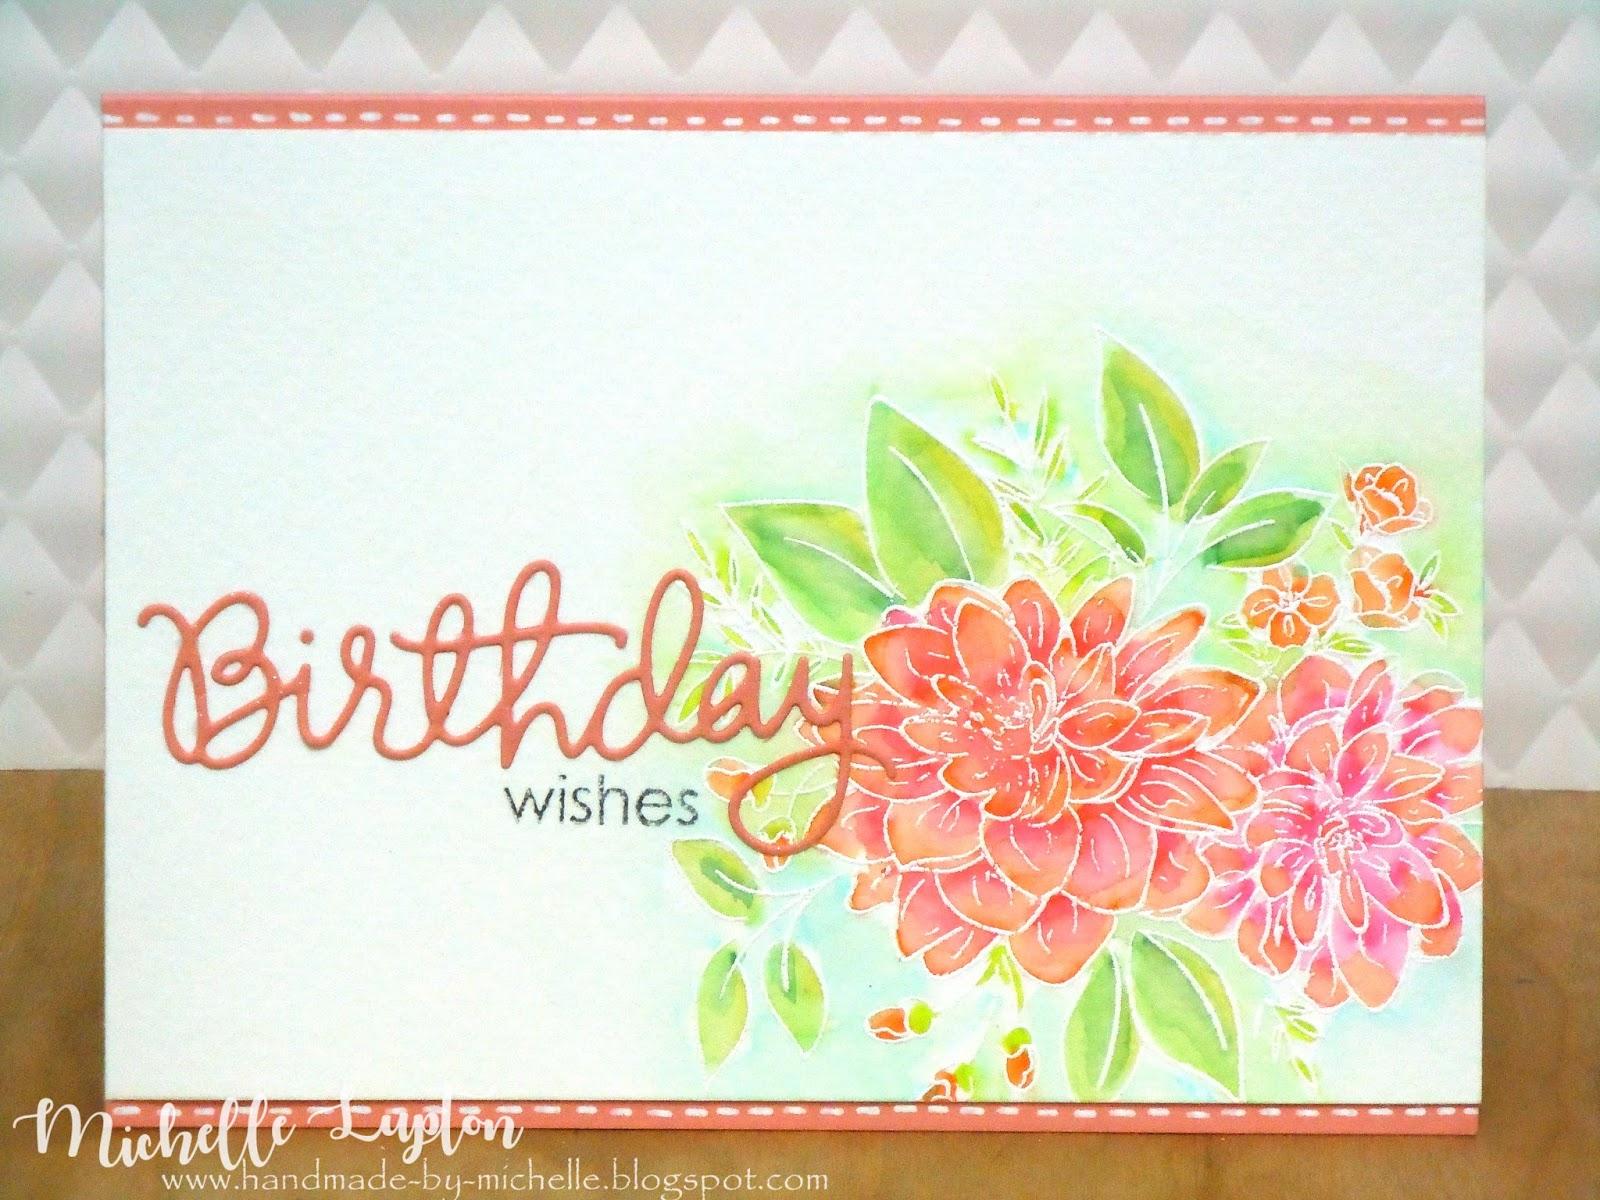 Handmade by Michelle Birthday wishes